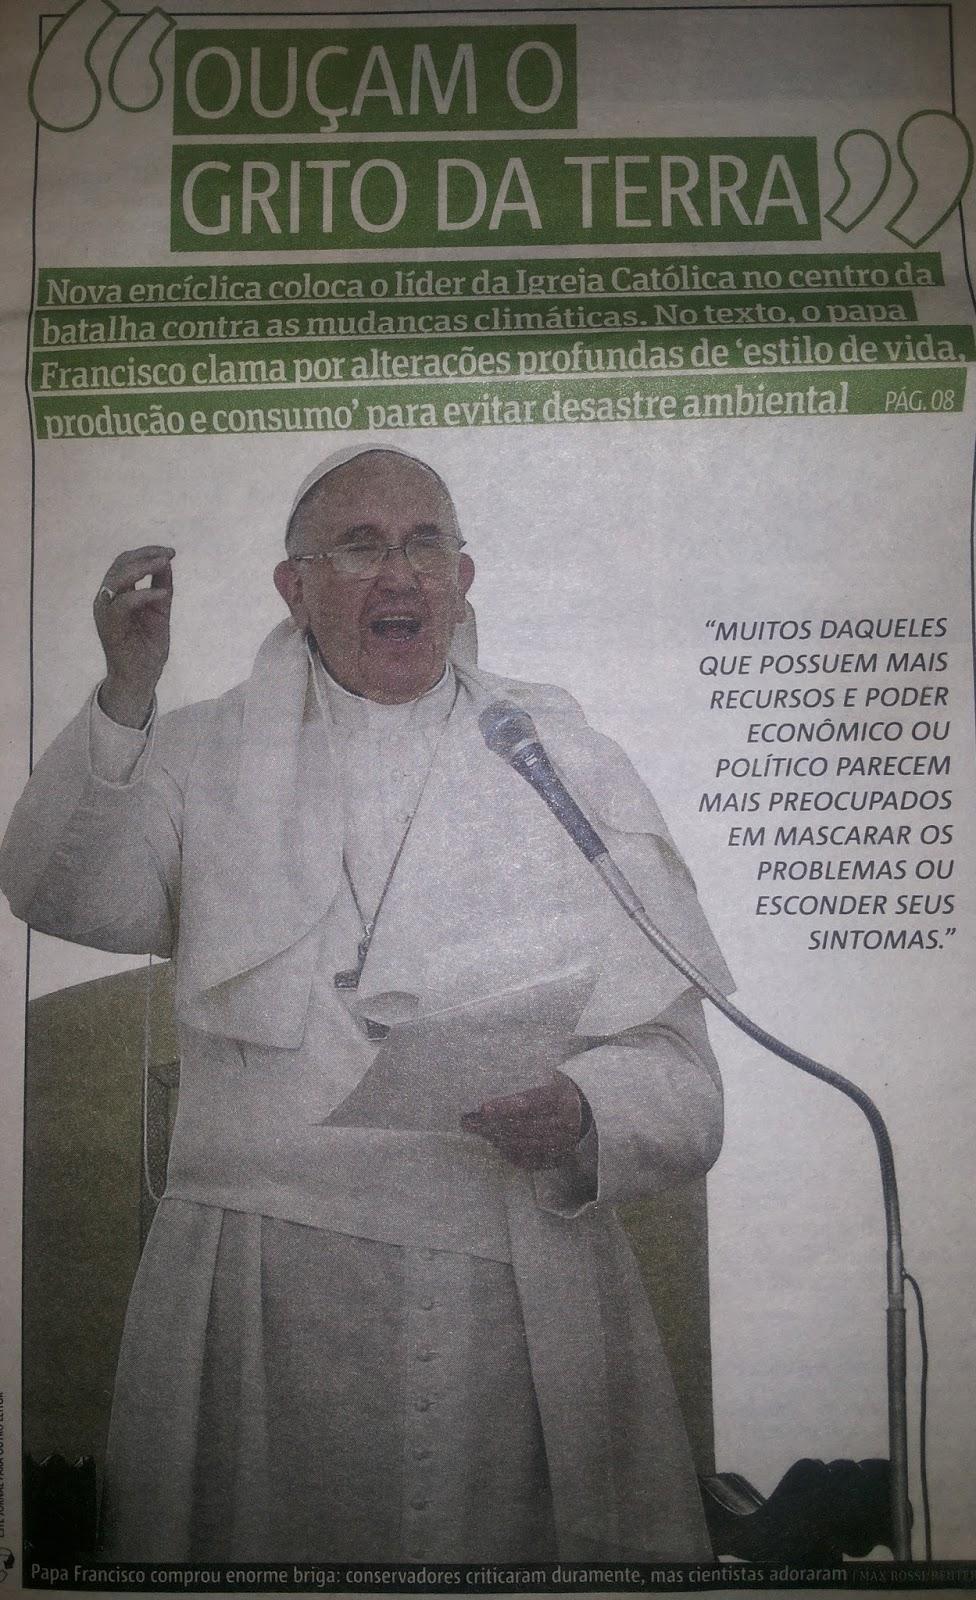 CLAMOR DO PAPA PELA NATUREZA